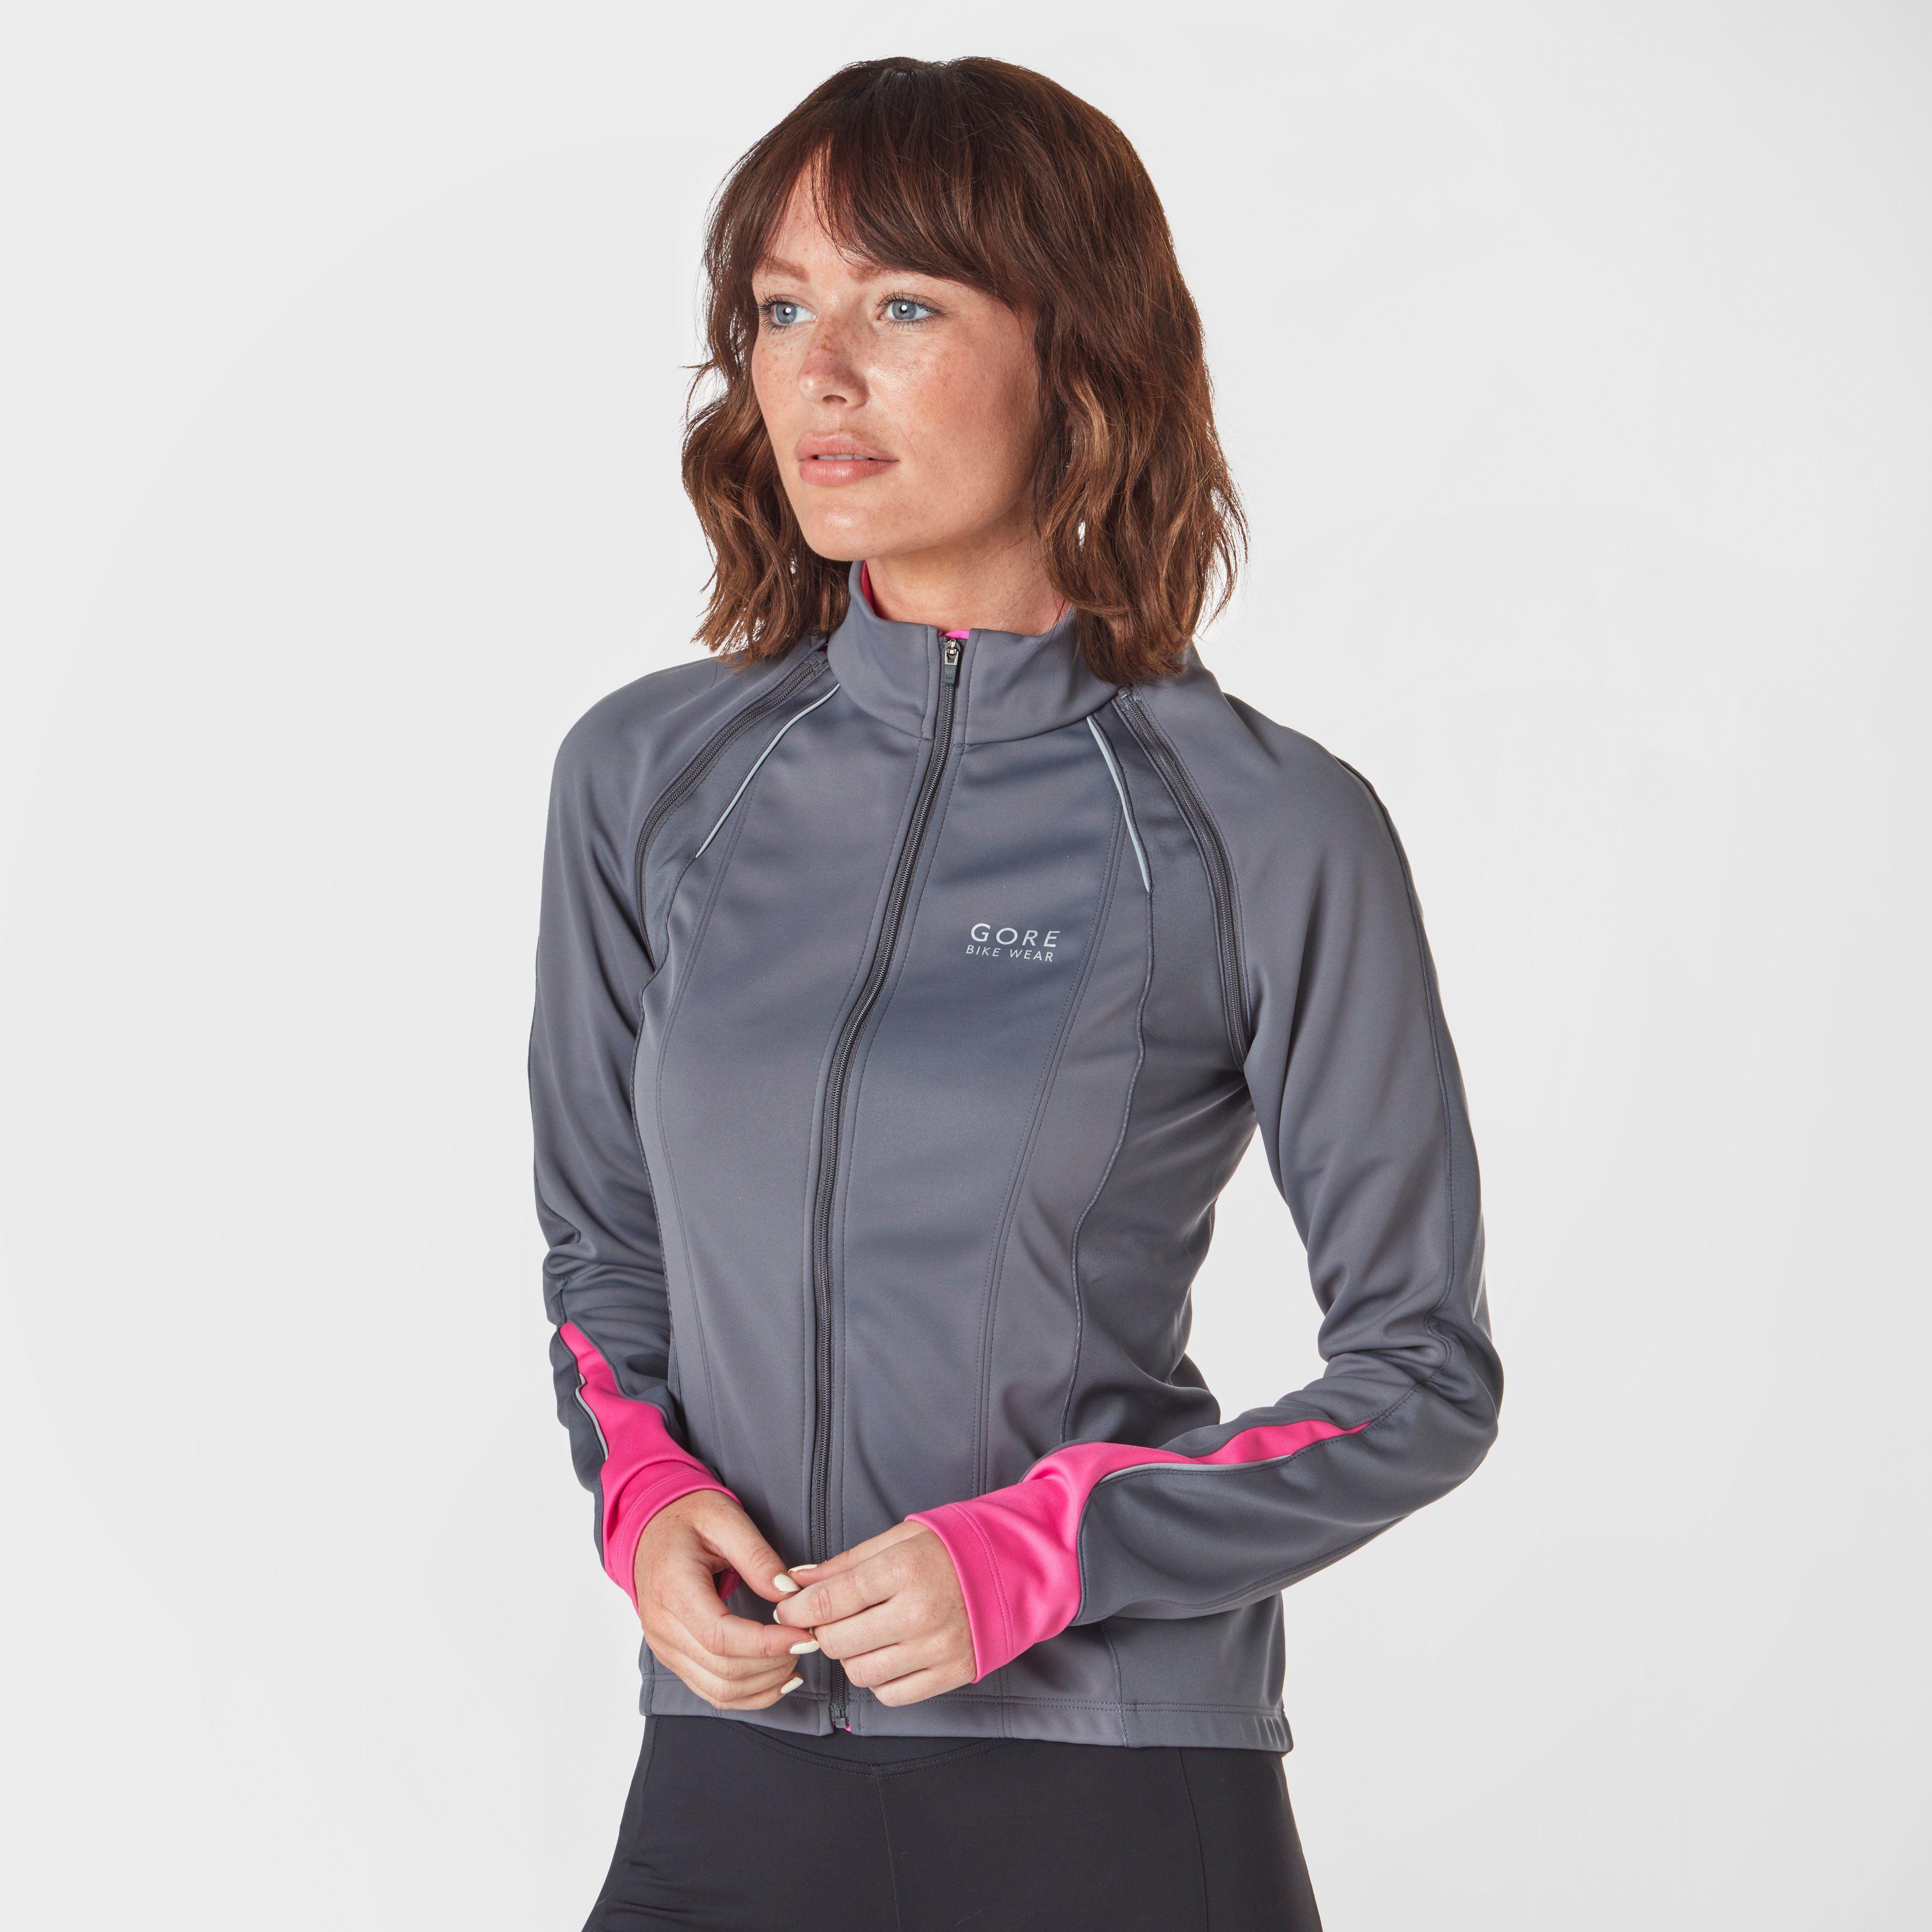 GORE Women's Phantom 2.0 WINDSTOPPER® Softshell Jacket